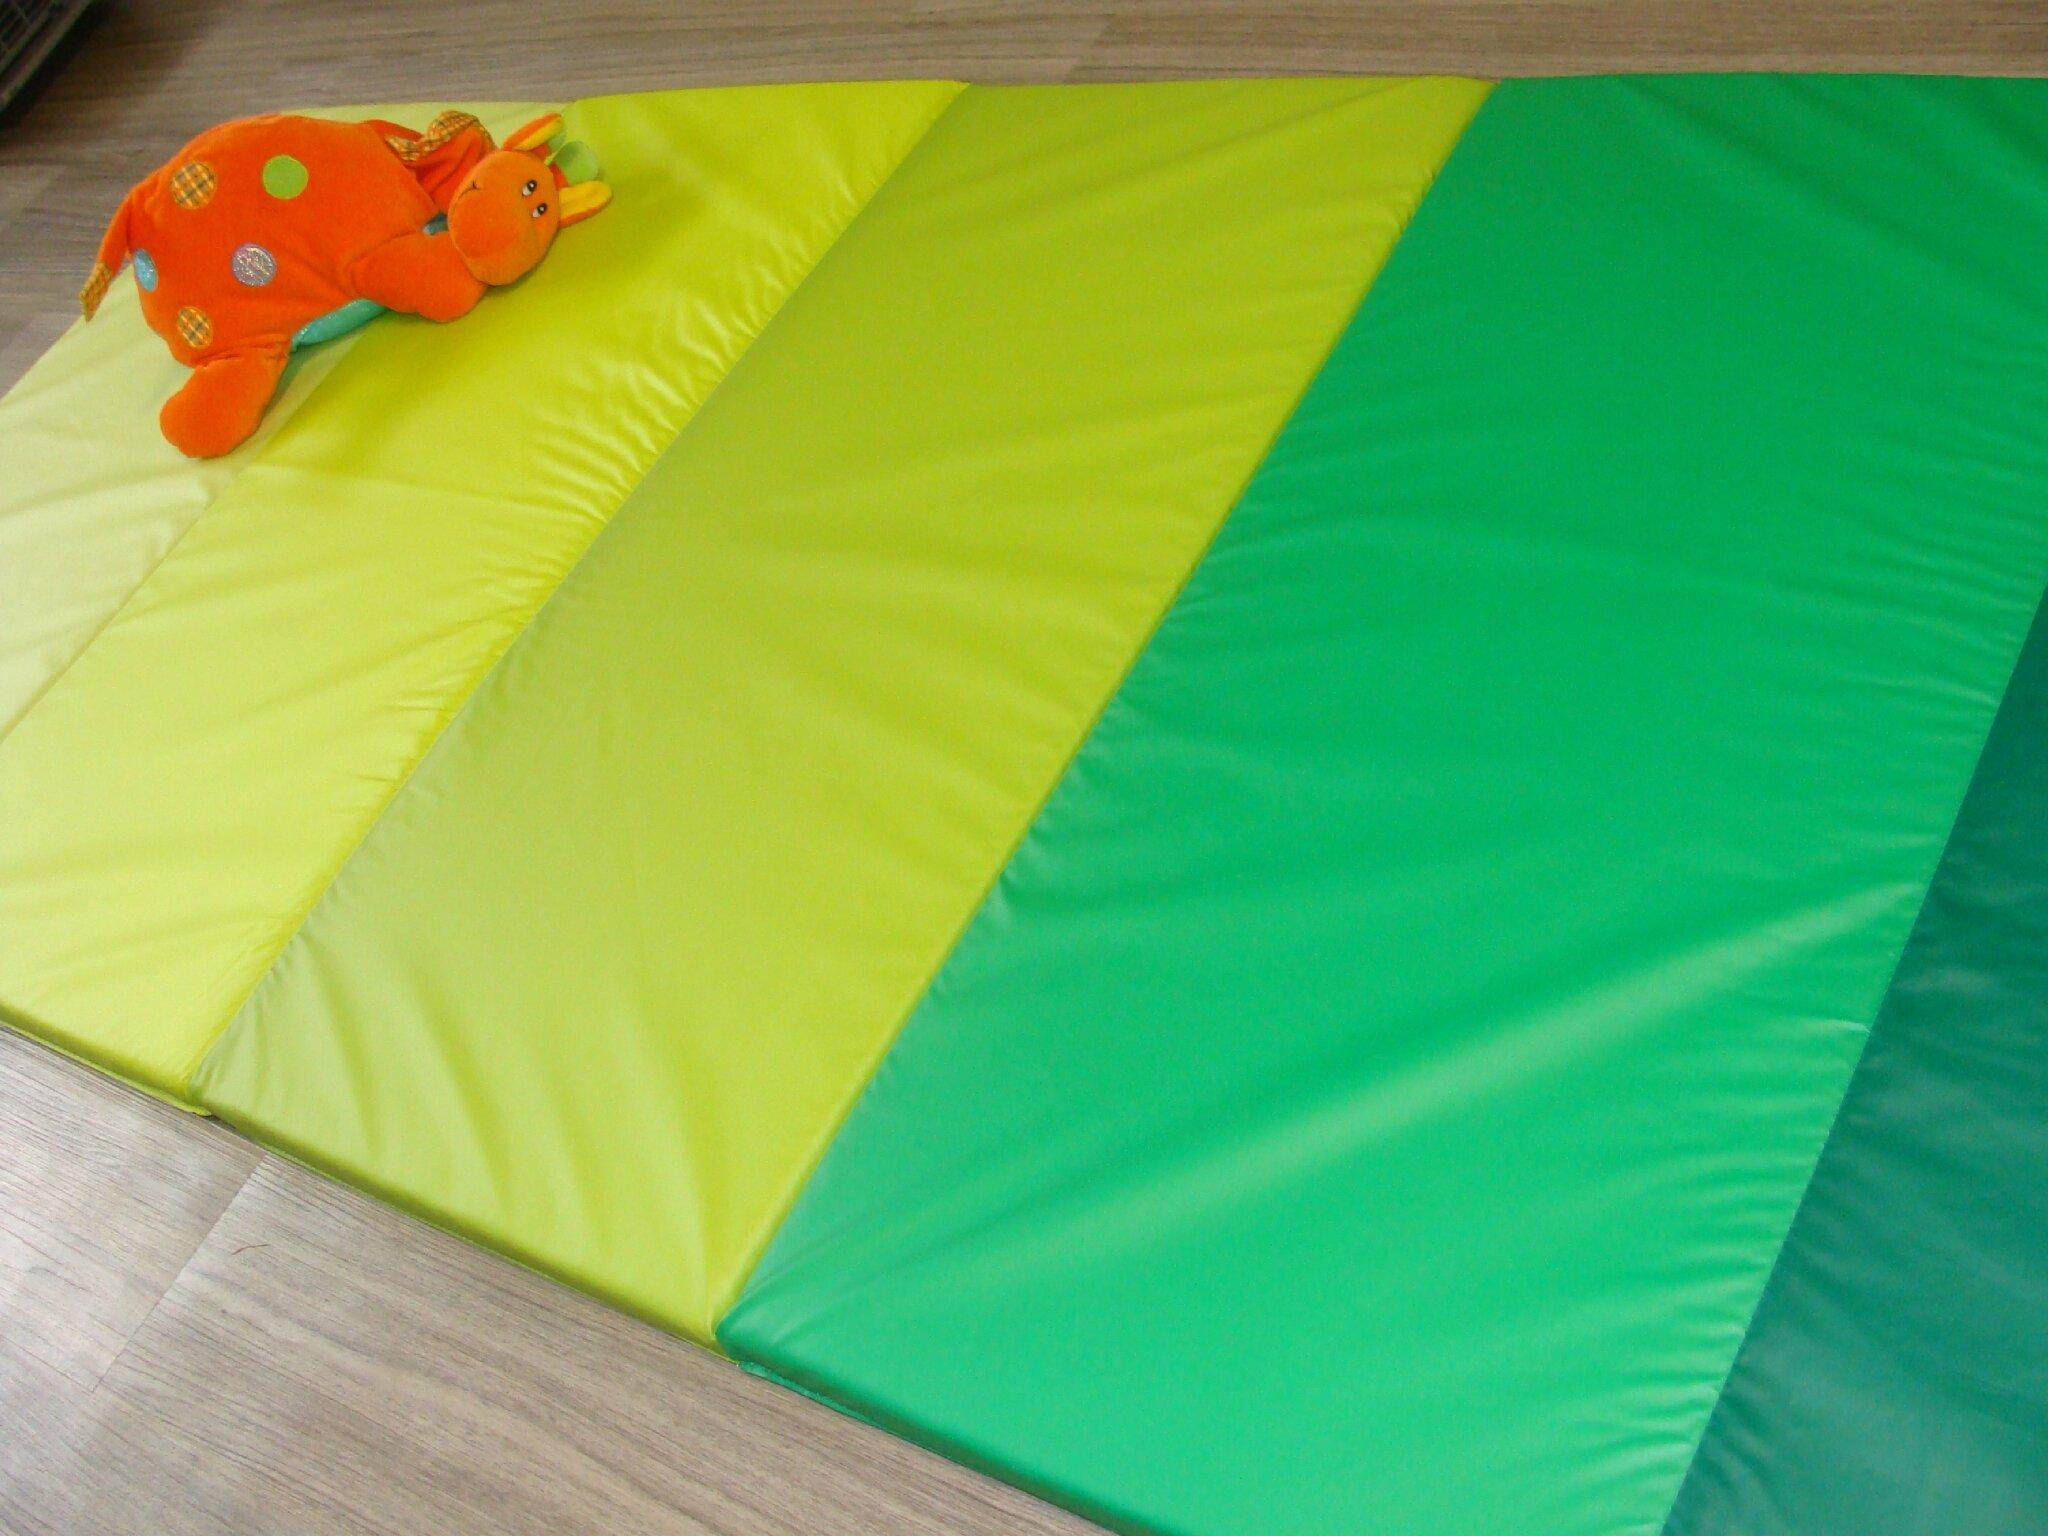 tapis matelas ikea 28 images tapis de gymnastique plufsig ikea avis tapis de gym achat. Black Bedroom Furniture Sets. Home Design Ideas